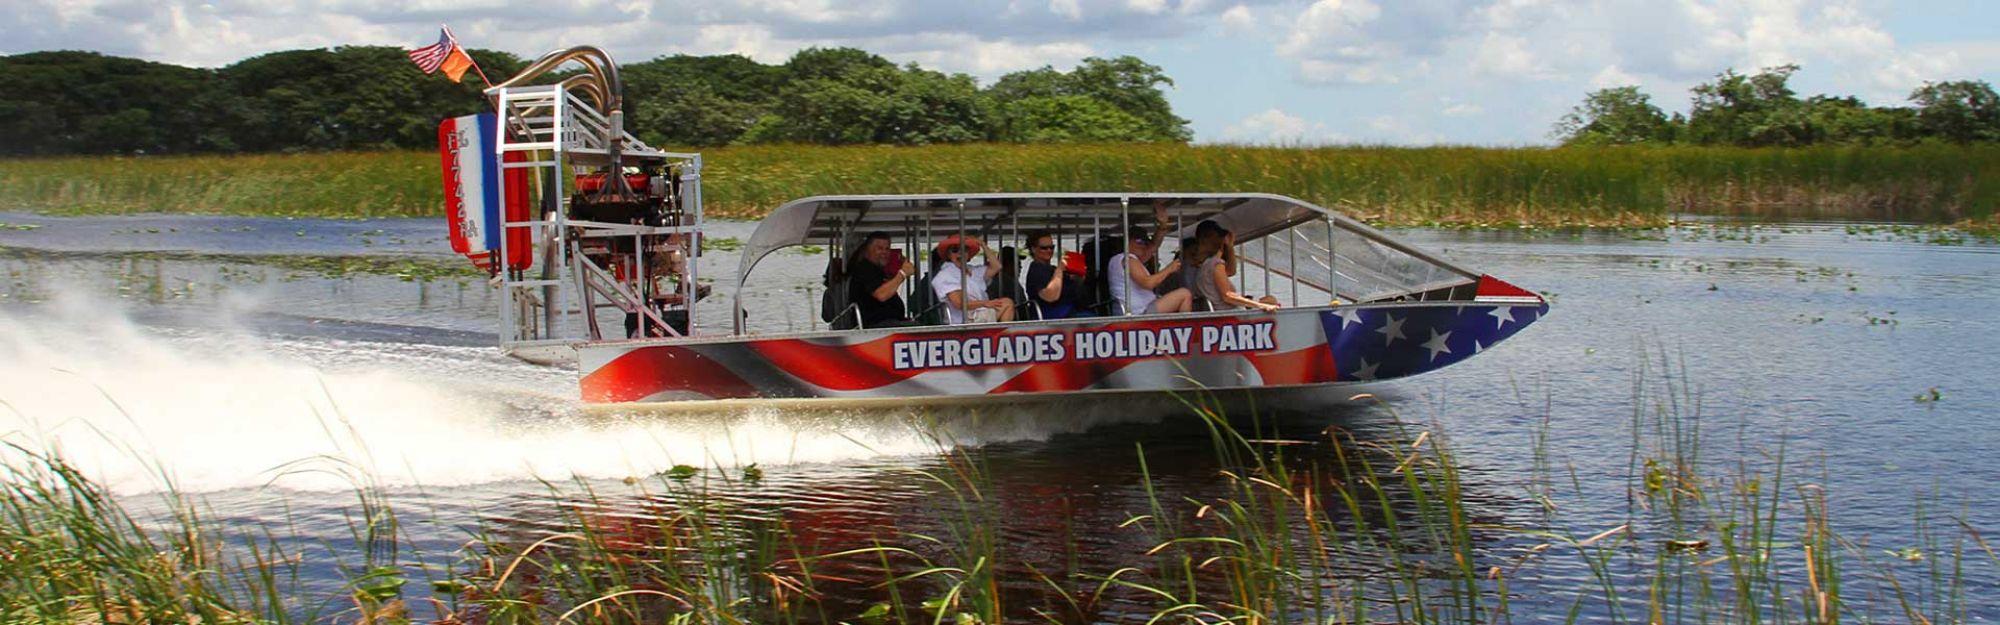 Miami Big Bus Everglades Experience